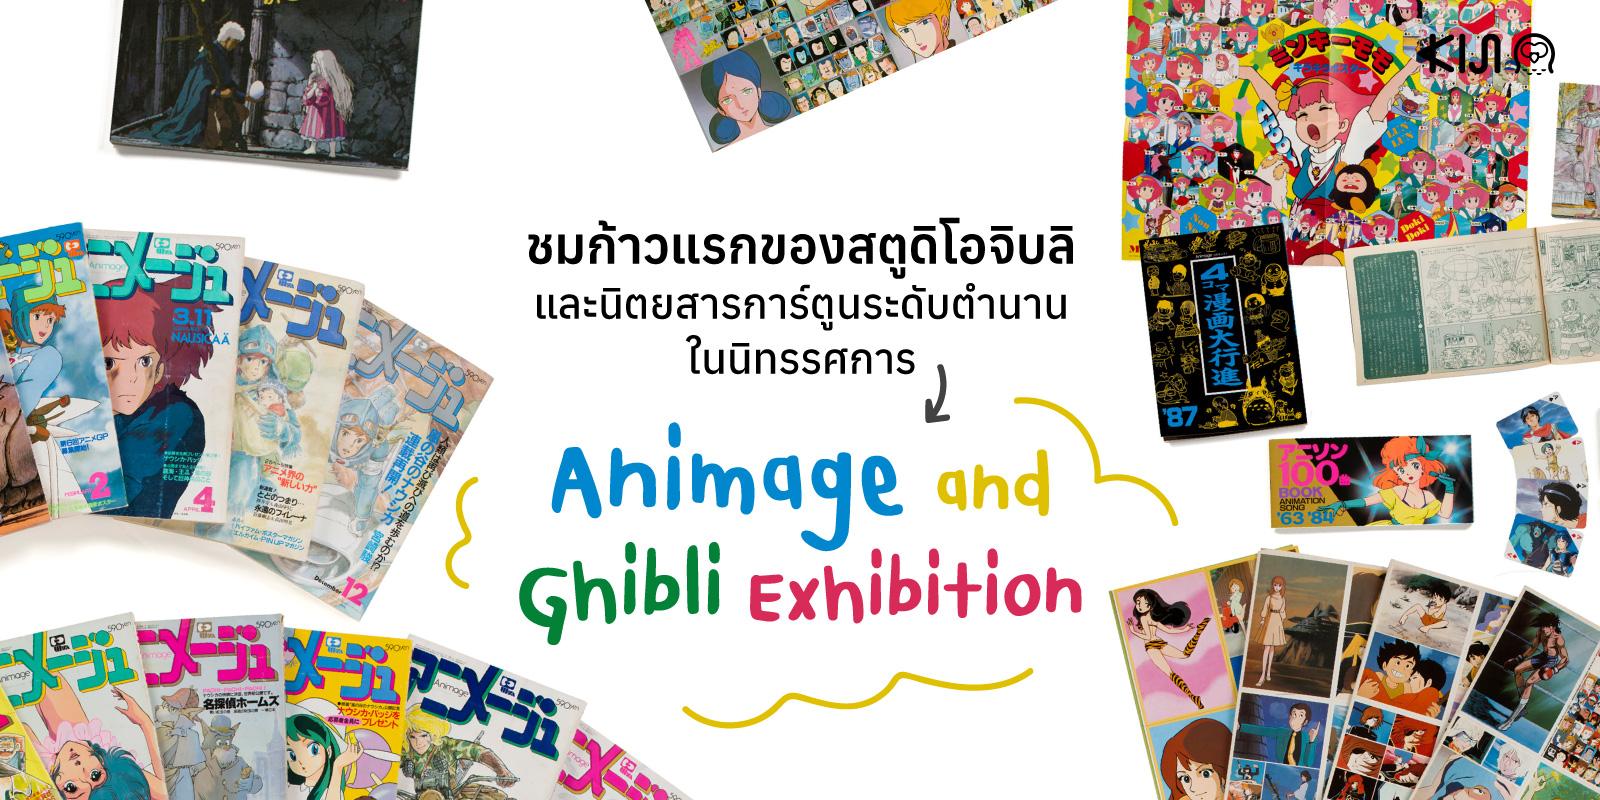 Animage and Ghibli Exhibition จัดที่โตเกียวและมิยากิ